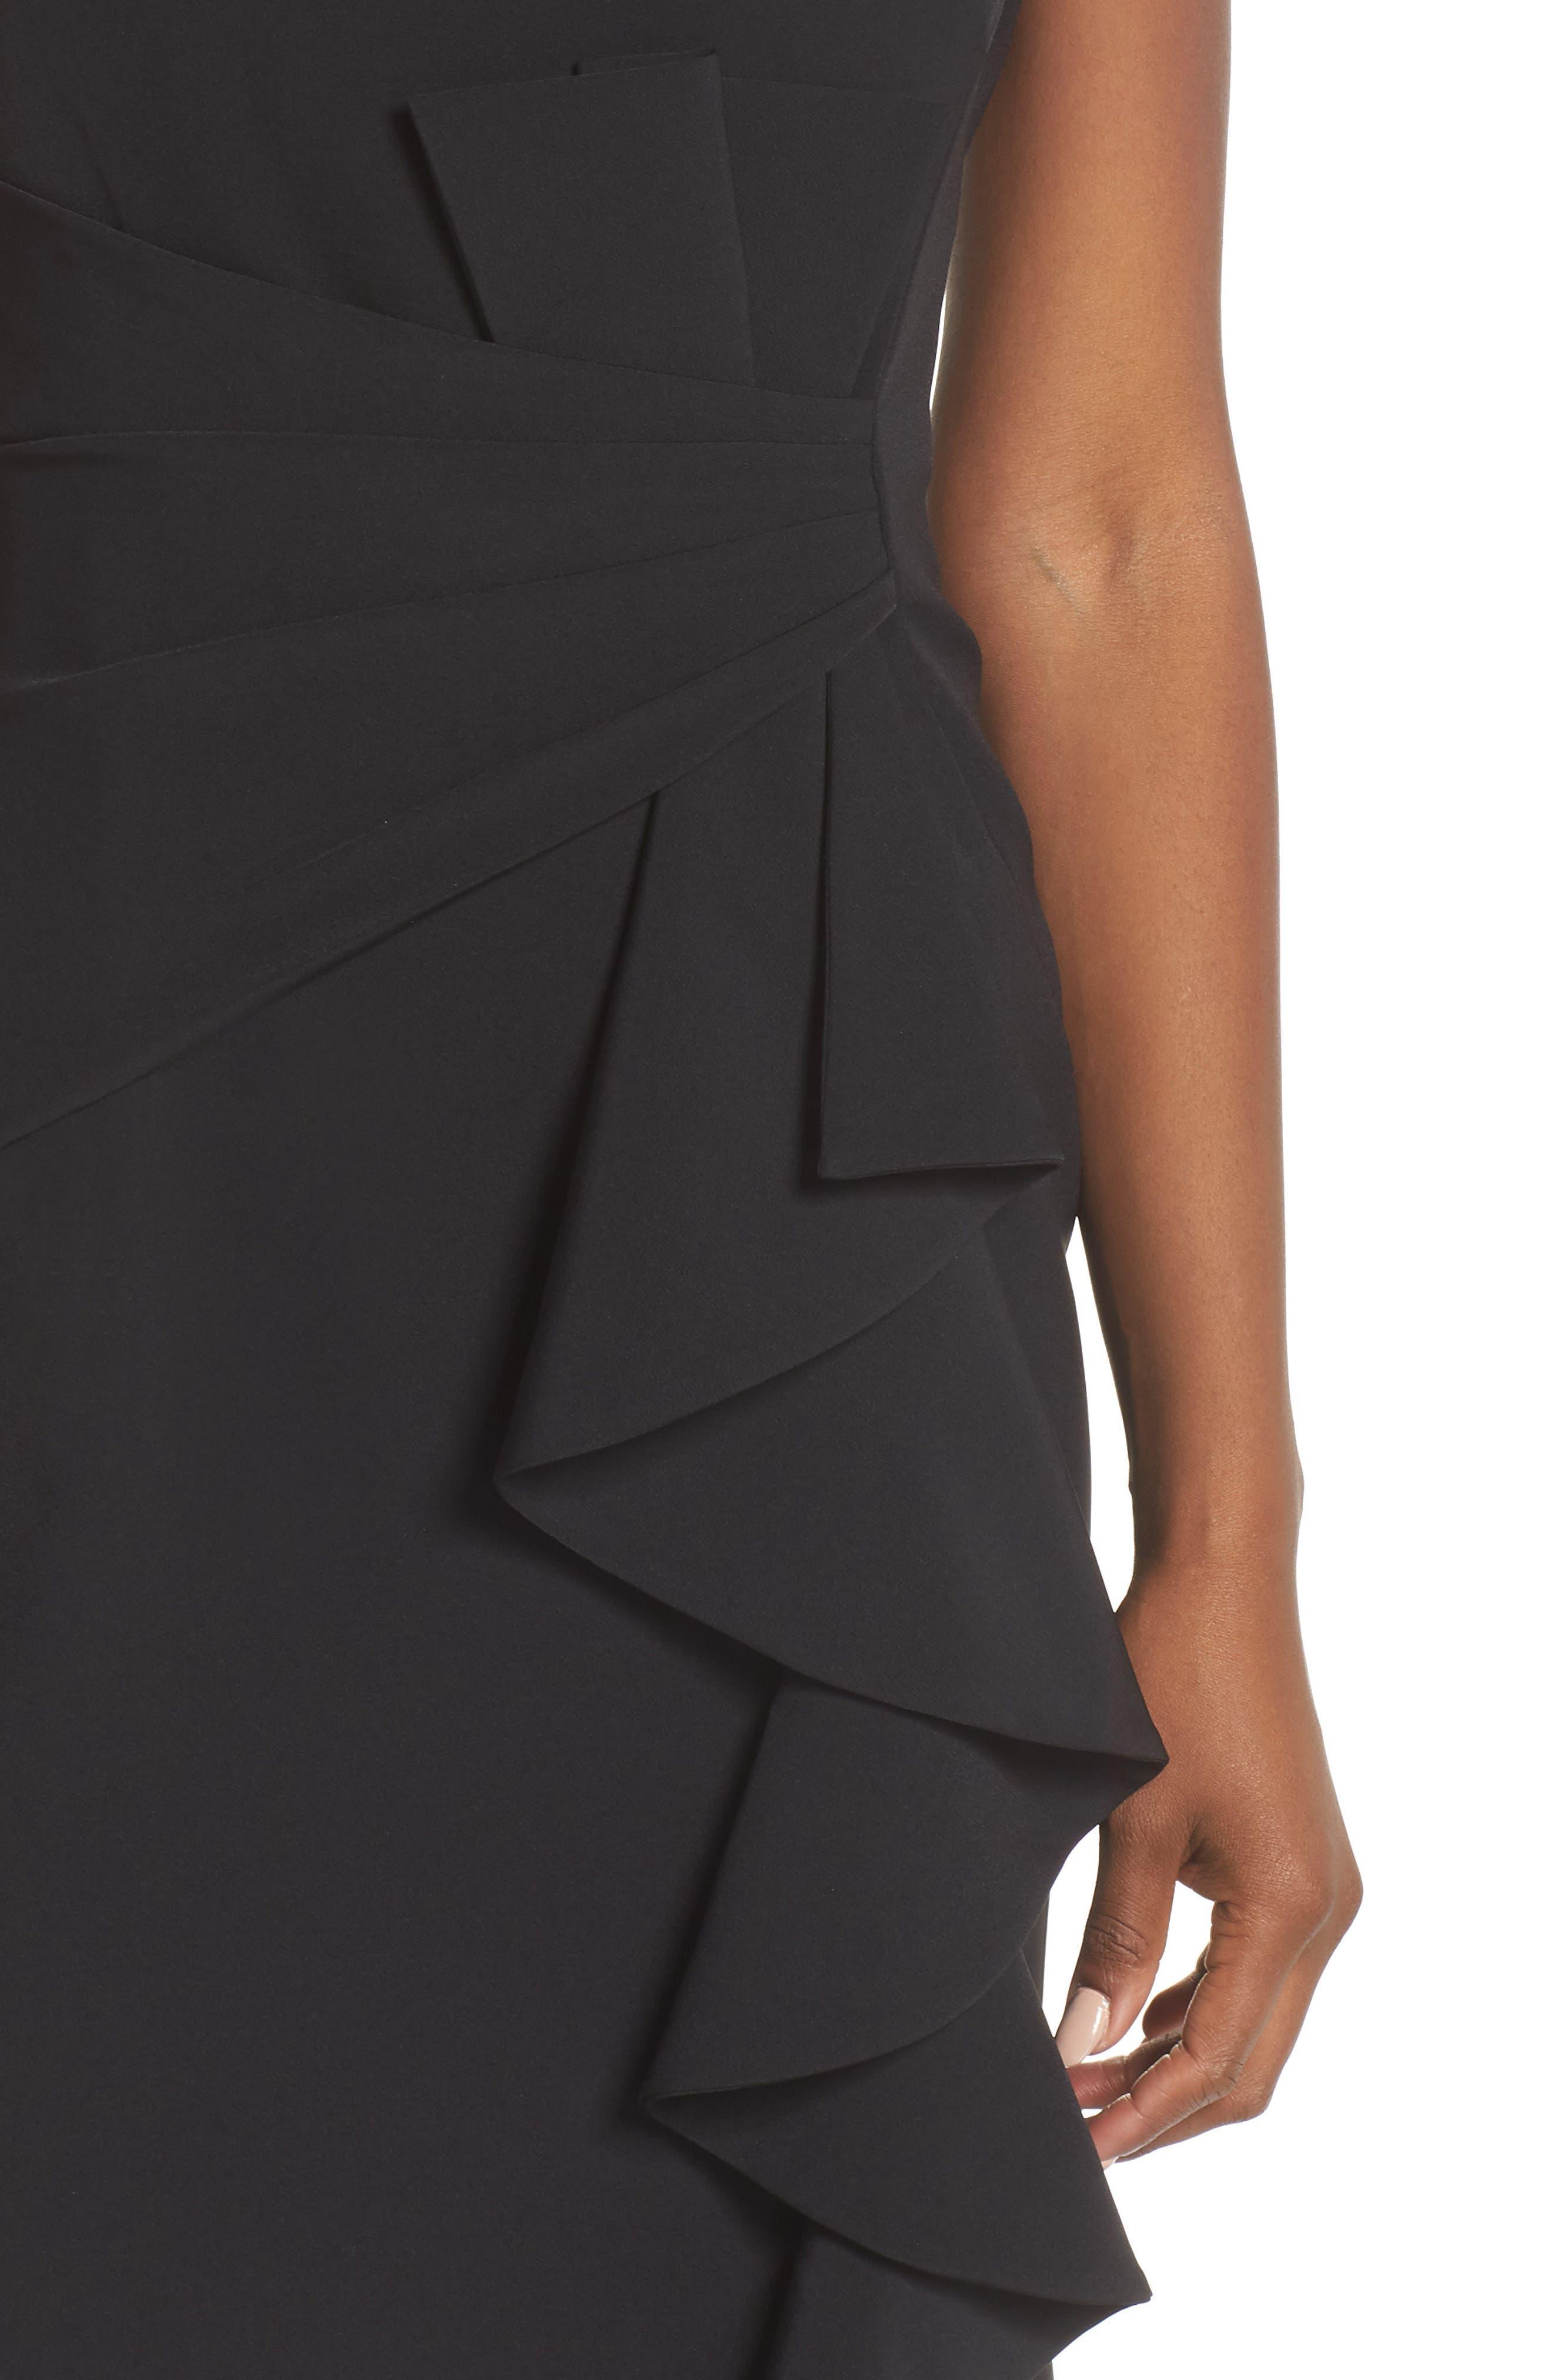 ELIZA J, Ruffle Front Gown, Alternate thumbnail 5, color, BLACK